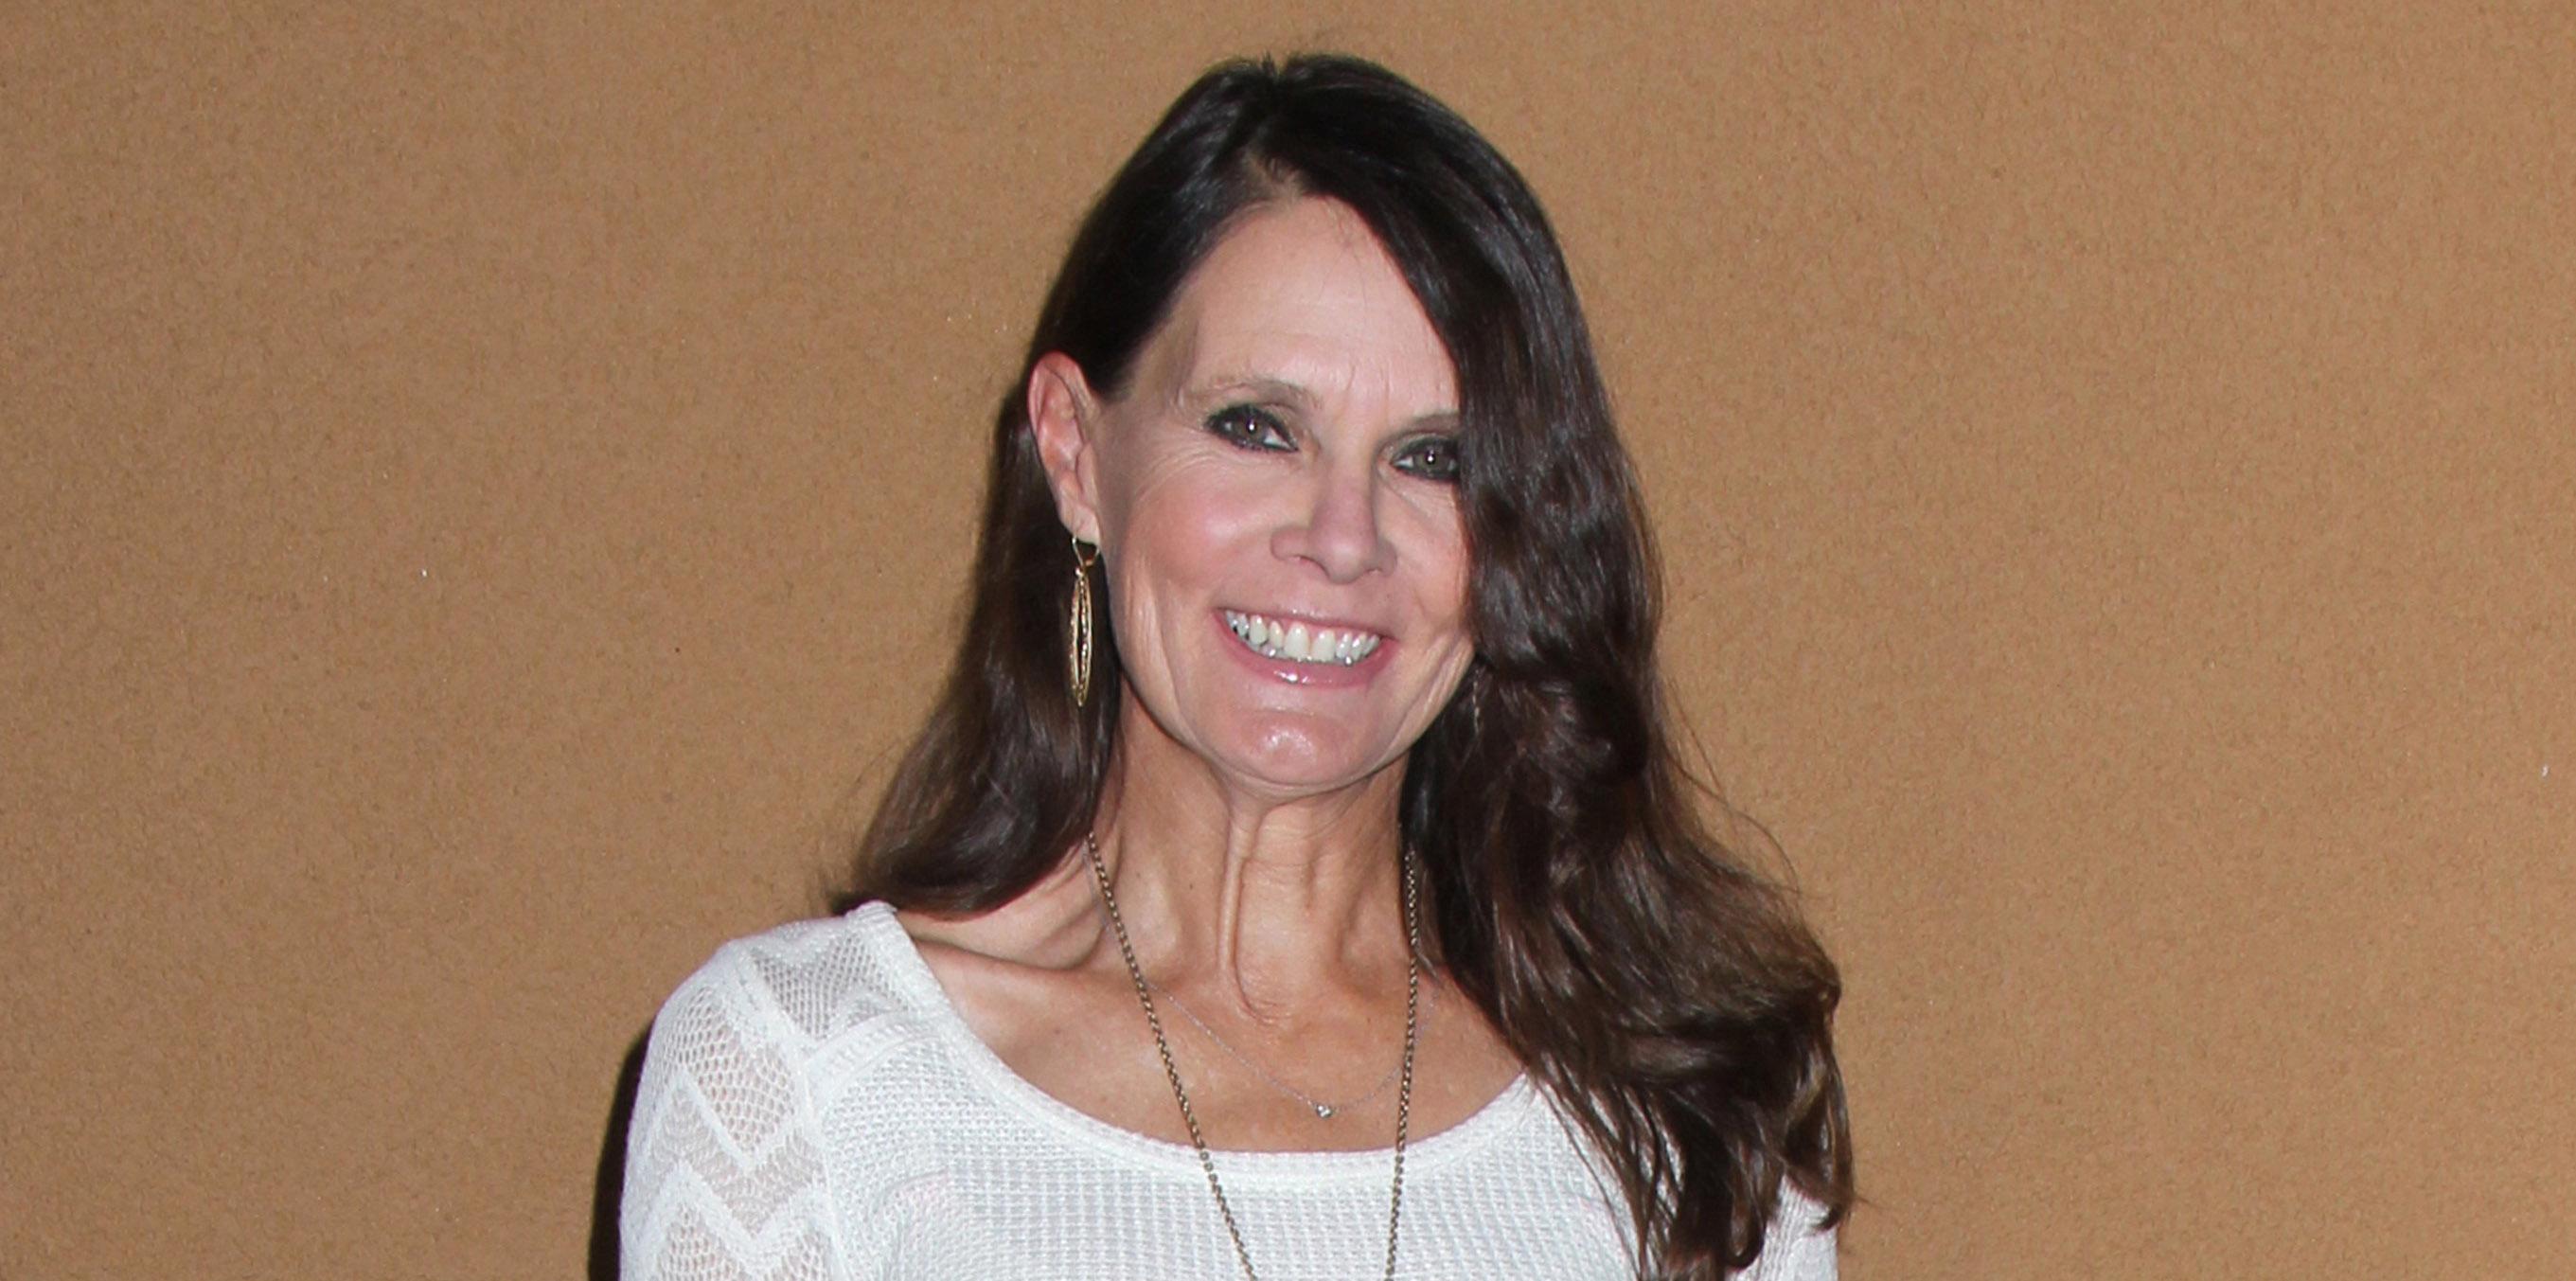 Lynn Herring & Kin Shriner Orlando Event